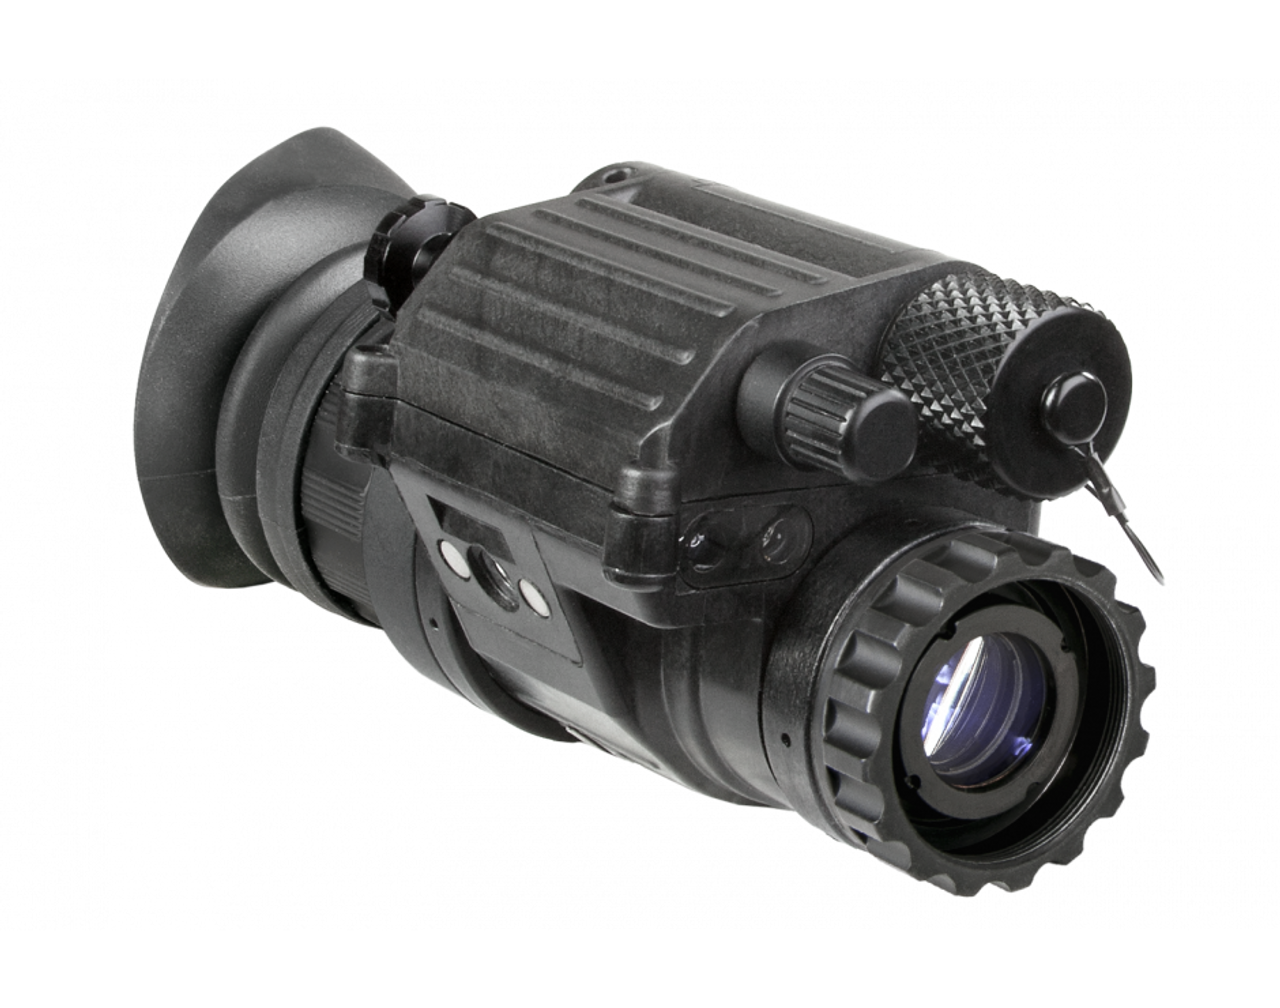 "AGM PVS14-51 3AW1 Night Vision Monocular 51 degree FOV Gen 3+ Auto-Gated ""White Phosphor Level 1"" (AGM PVS14-51 3AW1)"